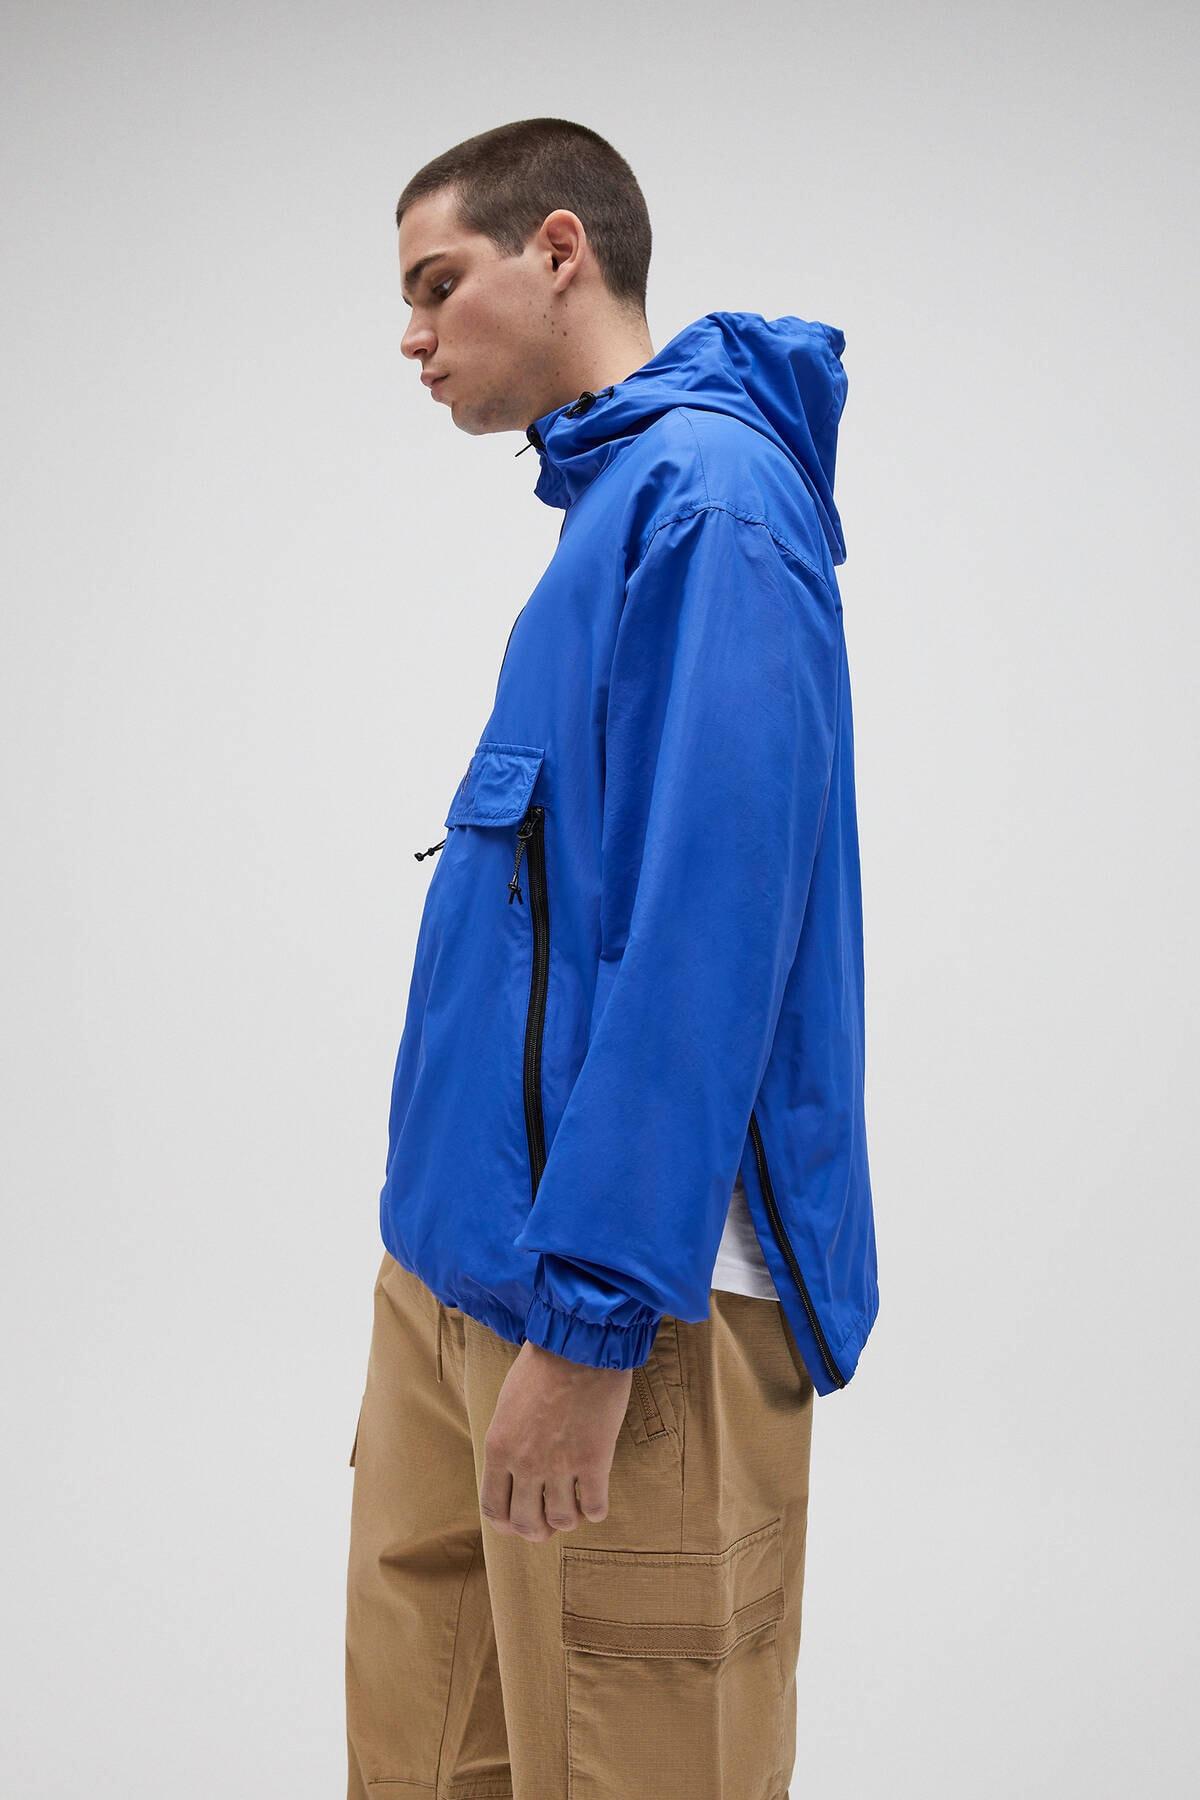 Pull & Bear Erkek Yoğun Mavi Basic Stwd Logolu Kanguru Mont 04711541 1